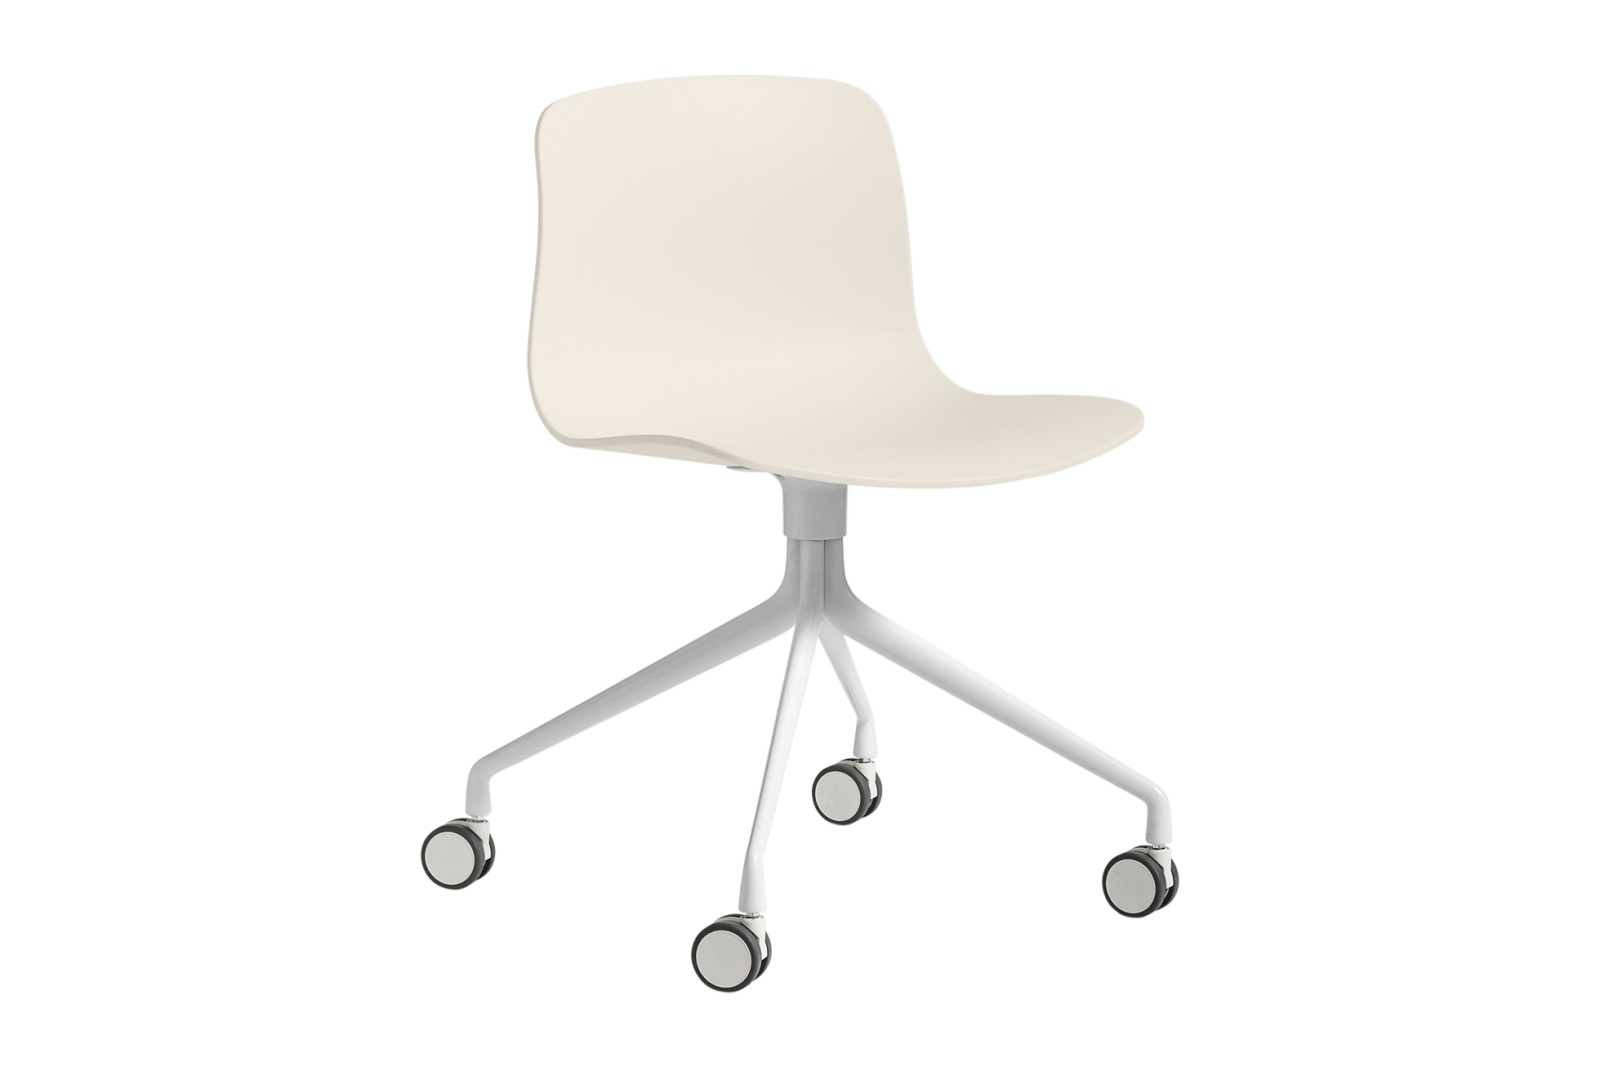 About A Chair AAC14 Cream white, White Powder Coated Aluminium